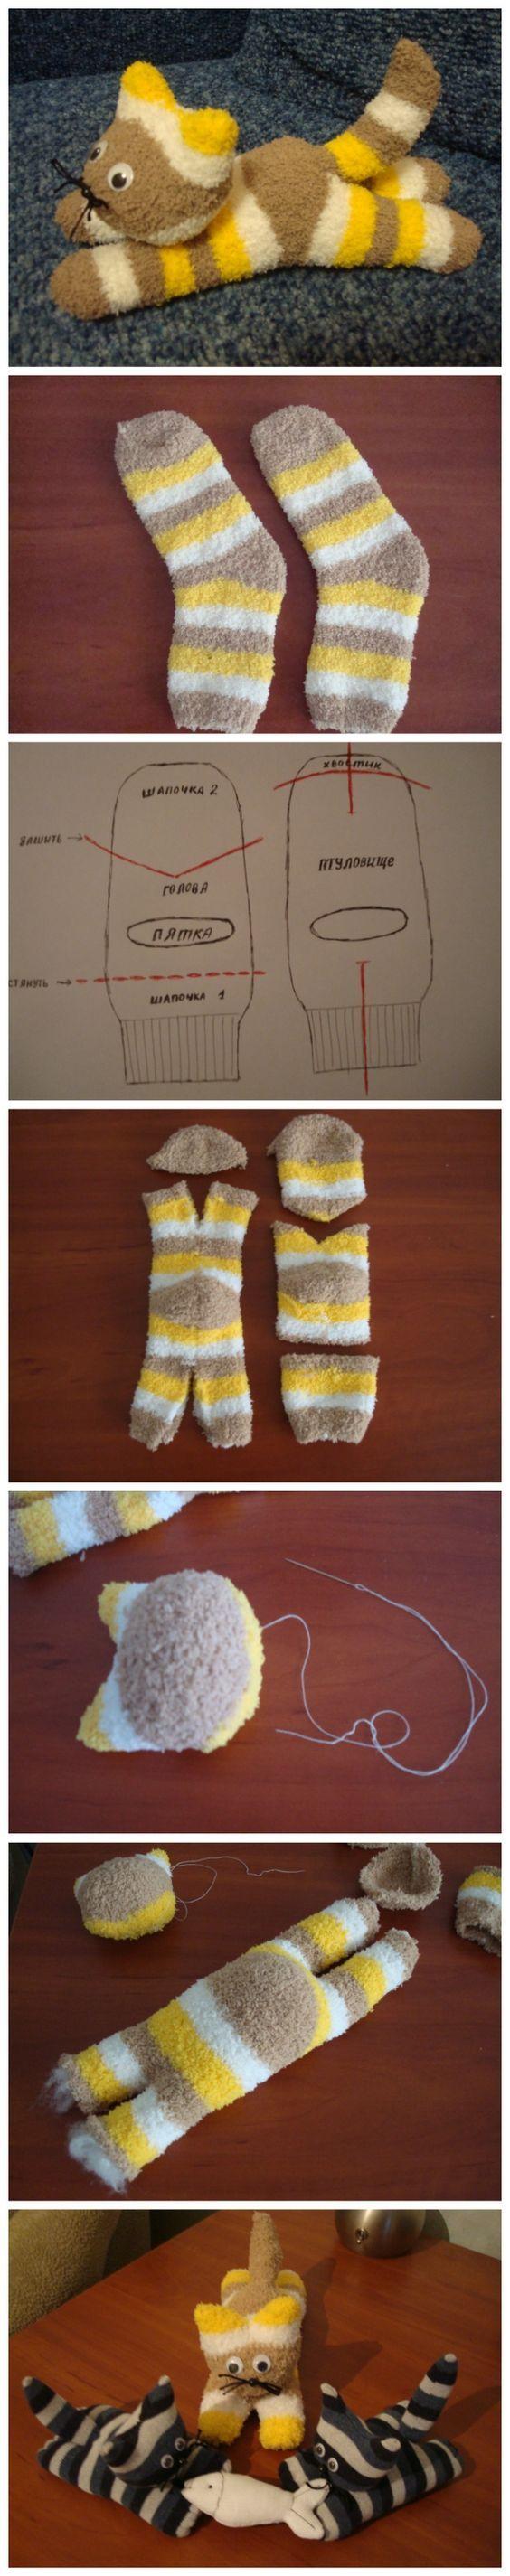 Chat chaussettes DIY: